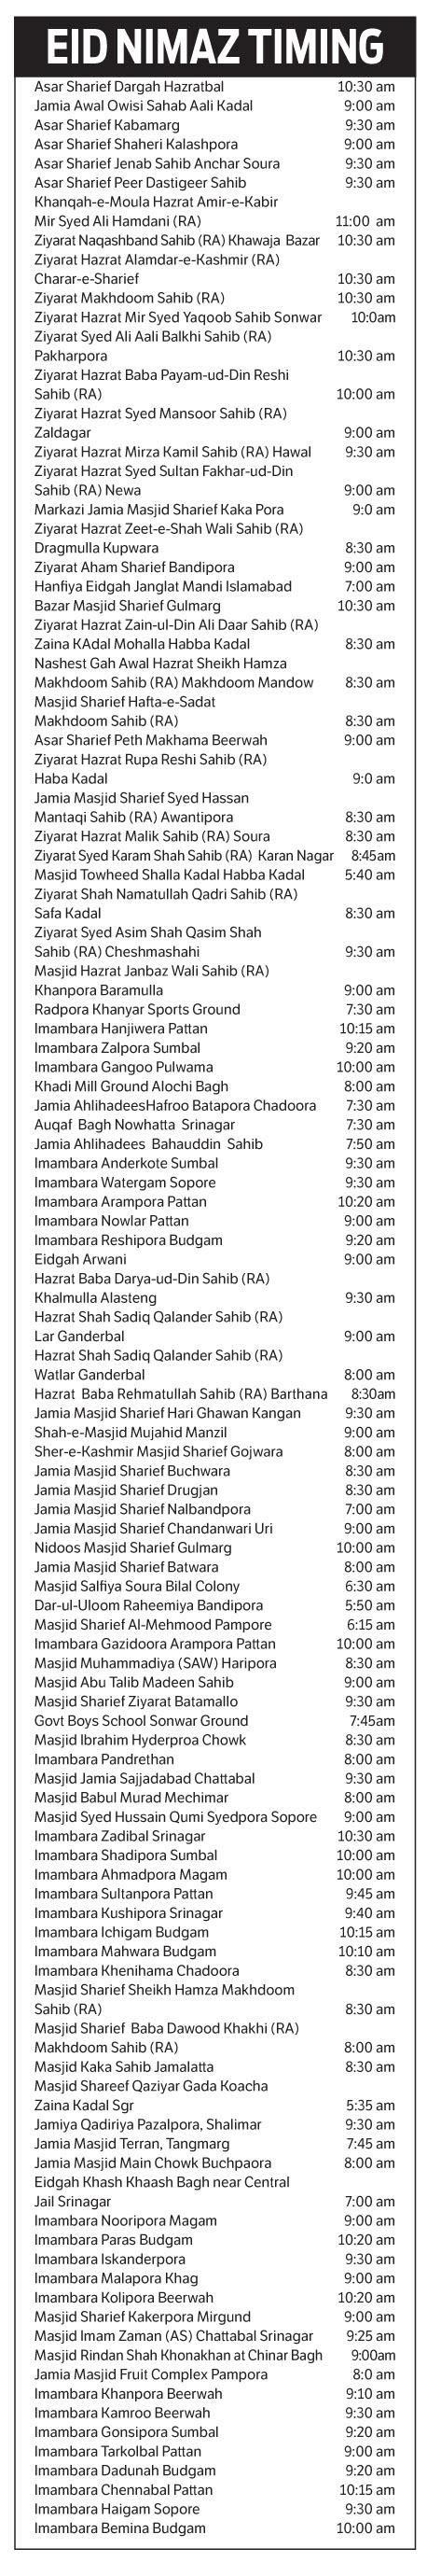 Eid timing srinagar Kashmir